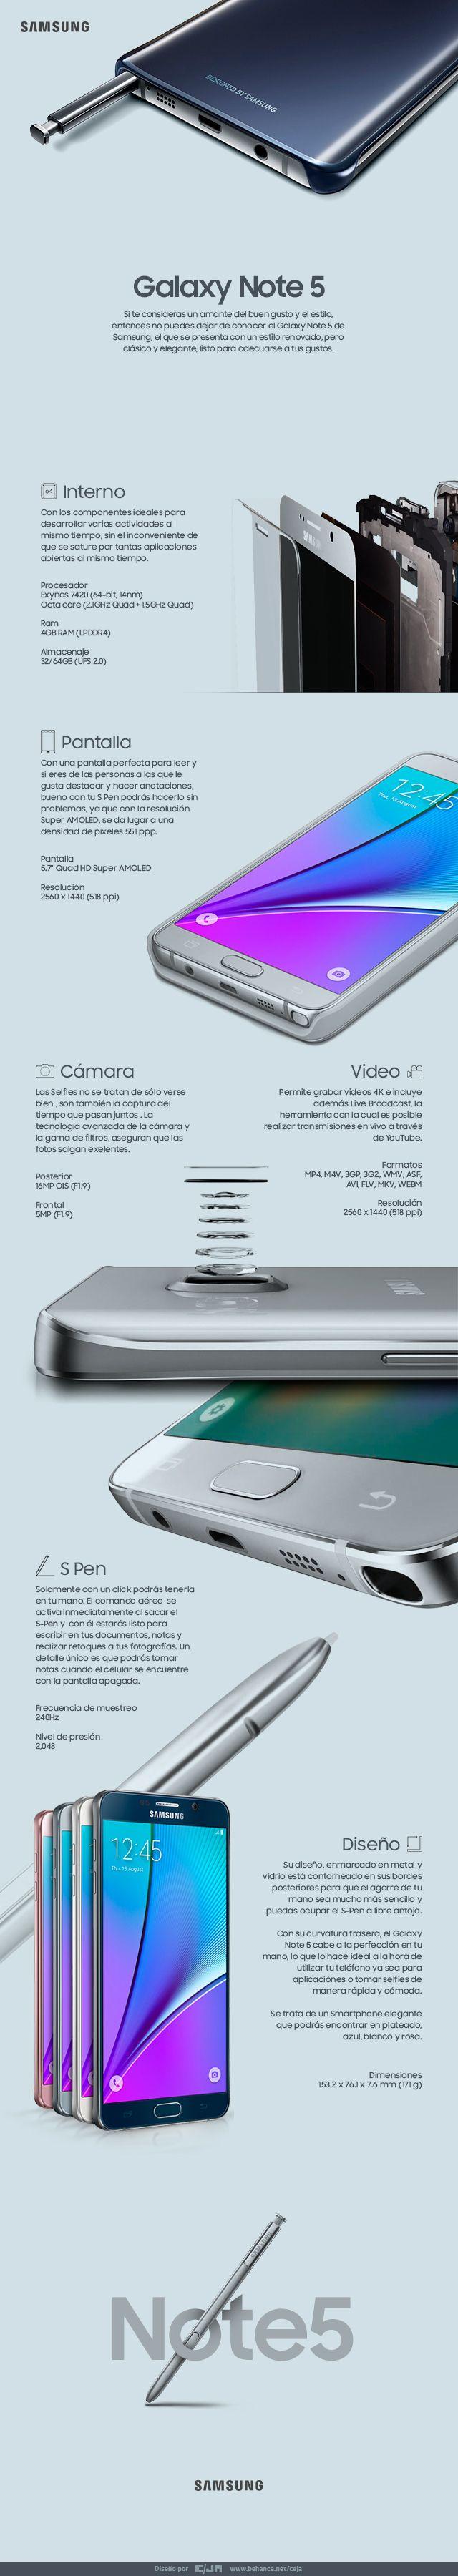 Samsung Galaxy Note 5 infografia infographic